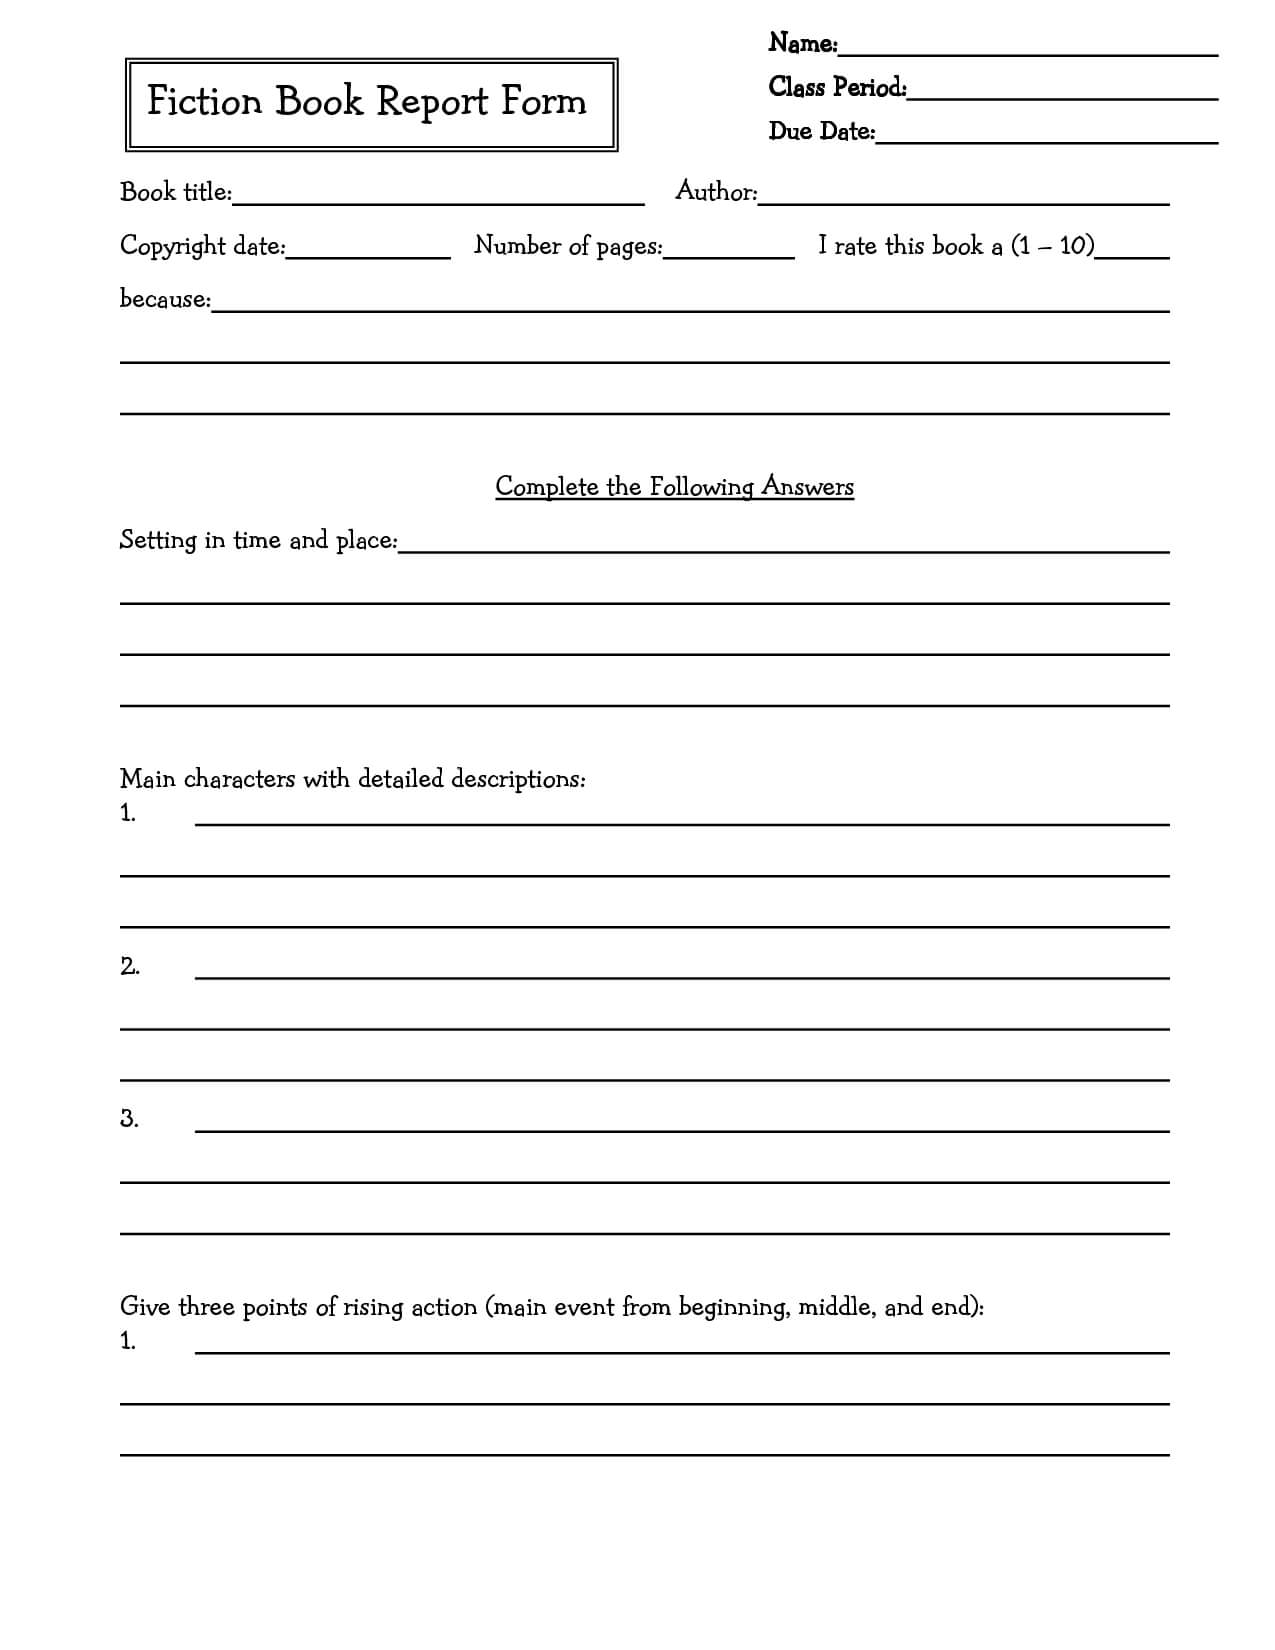 Middle School Book Report Brochure. 6Th Grade | 7Th Grade Regarding Middle School Book Report Template